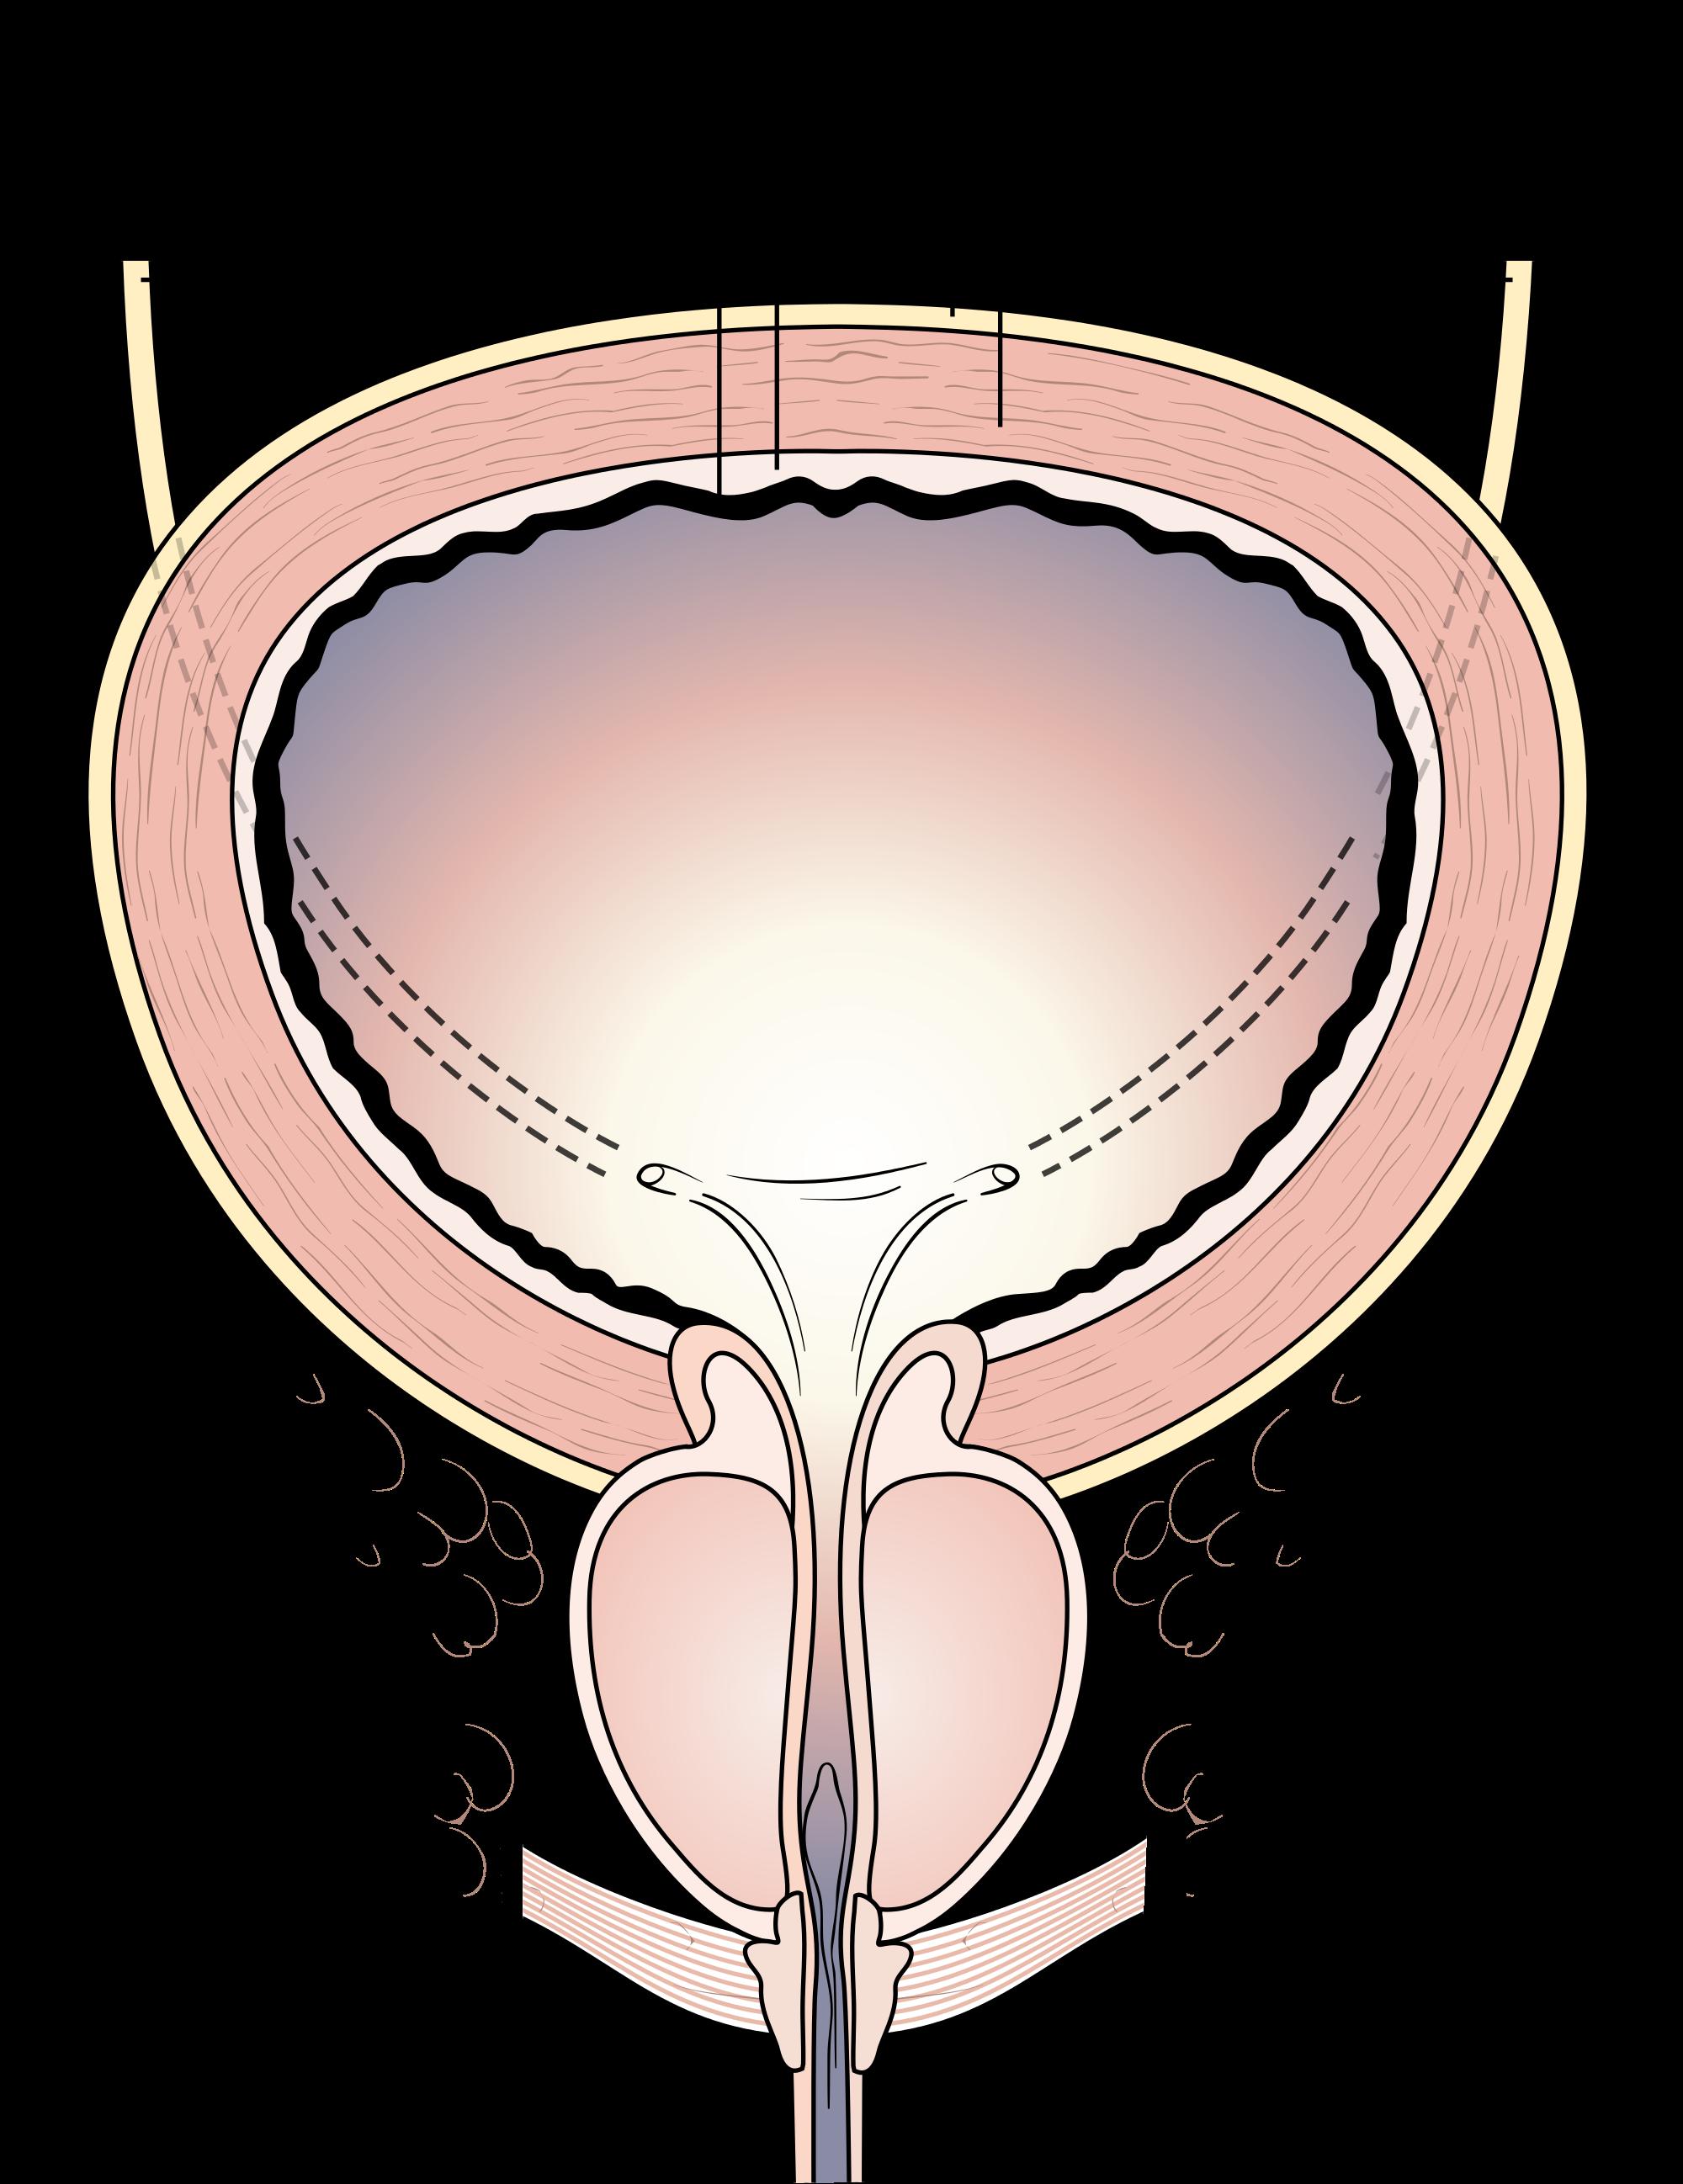 Kidney clipart ureter. Bladder pain shy urinating